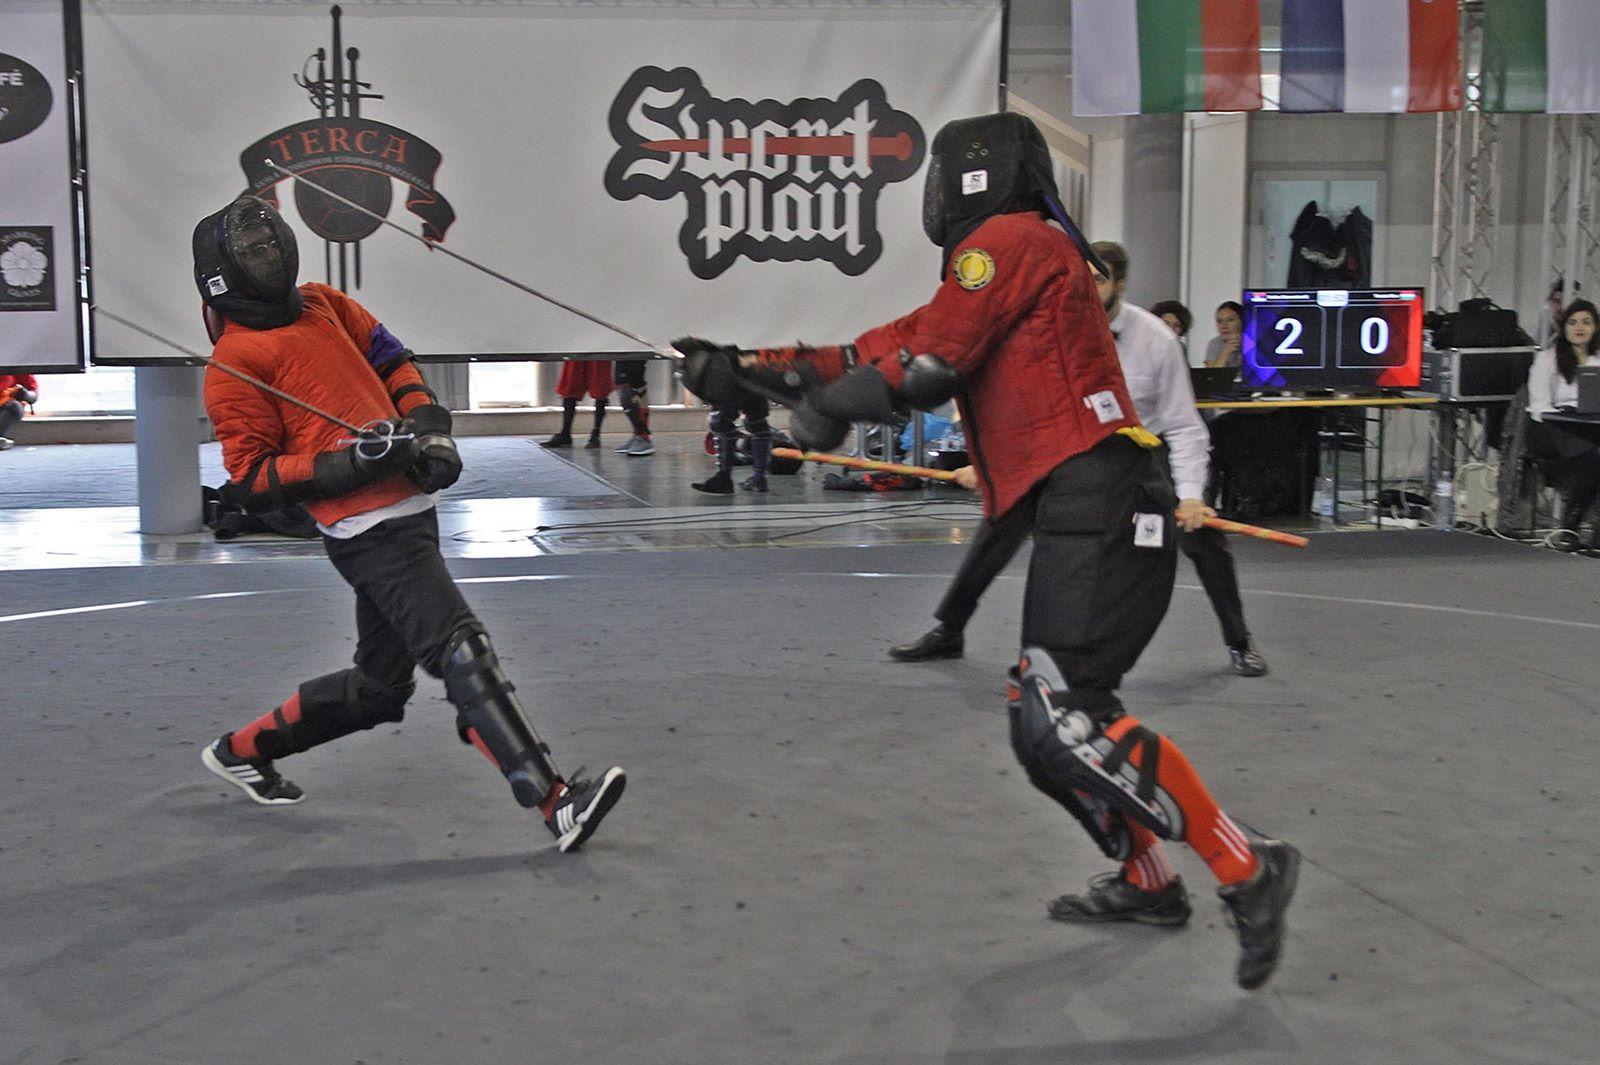 Swordplay 06 – 08.12.2019 Sajam